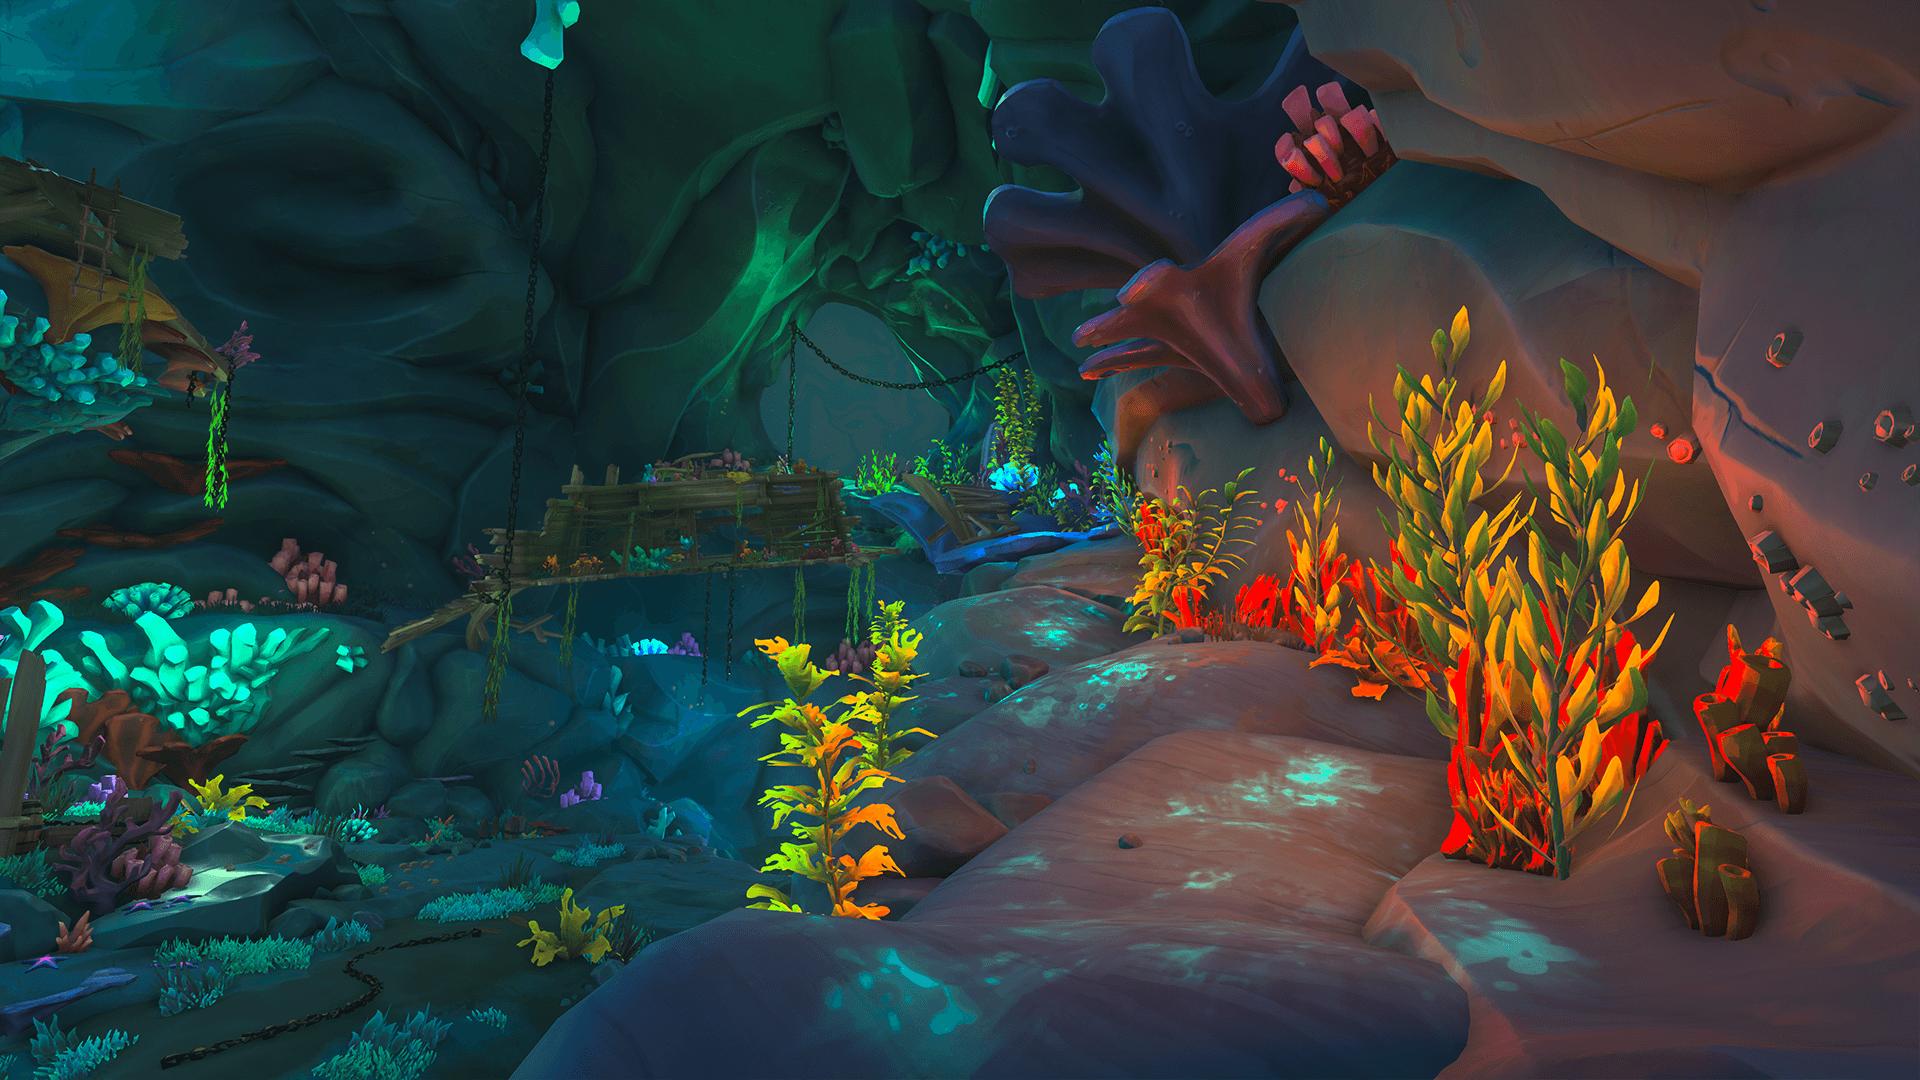 Citadel-Cavern 3, Path to the Shipwreck